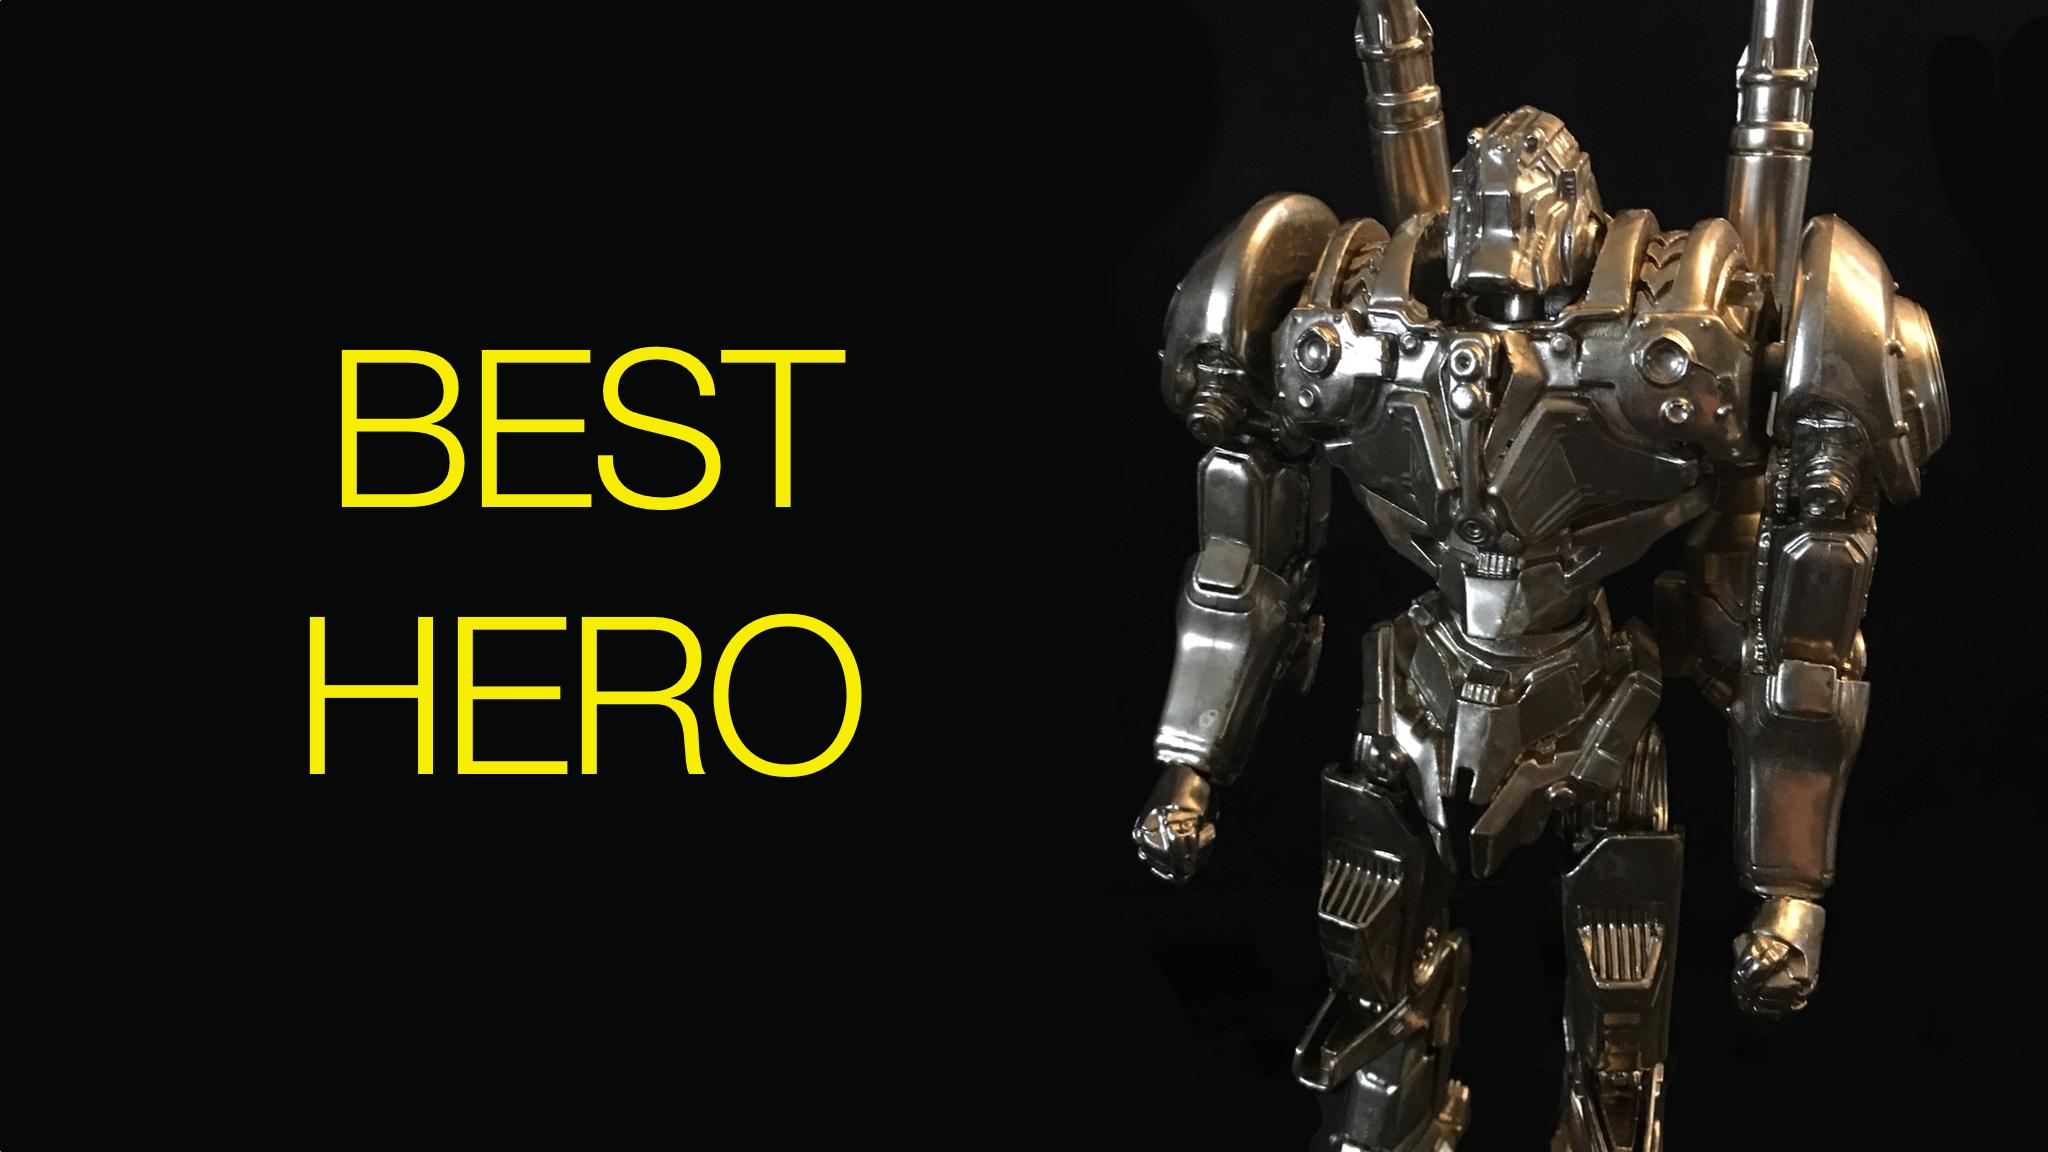 BEST HERO 2048X1152.jpg